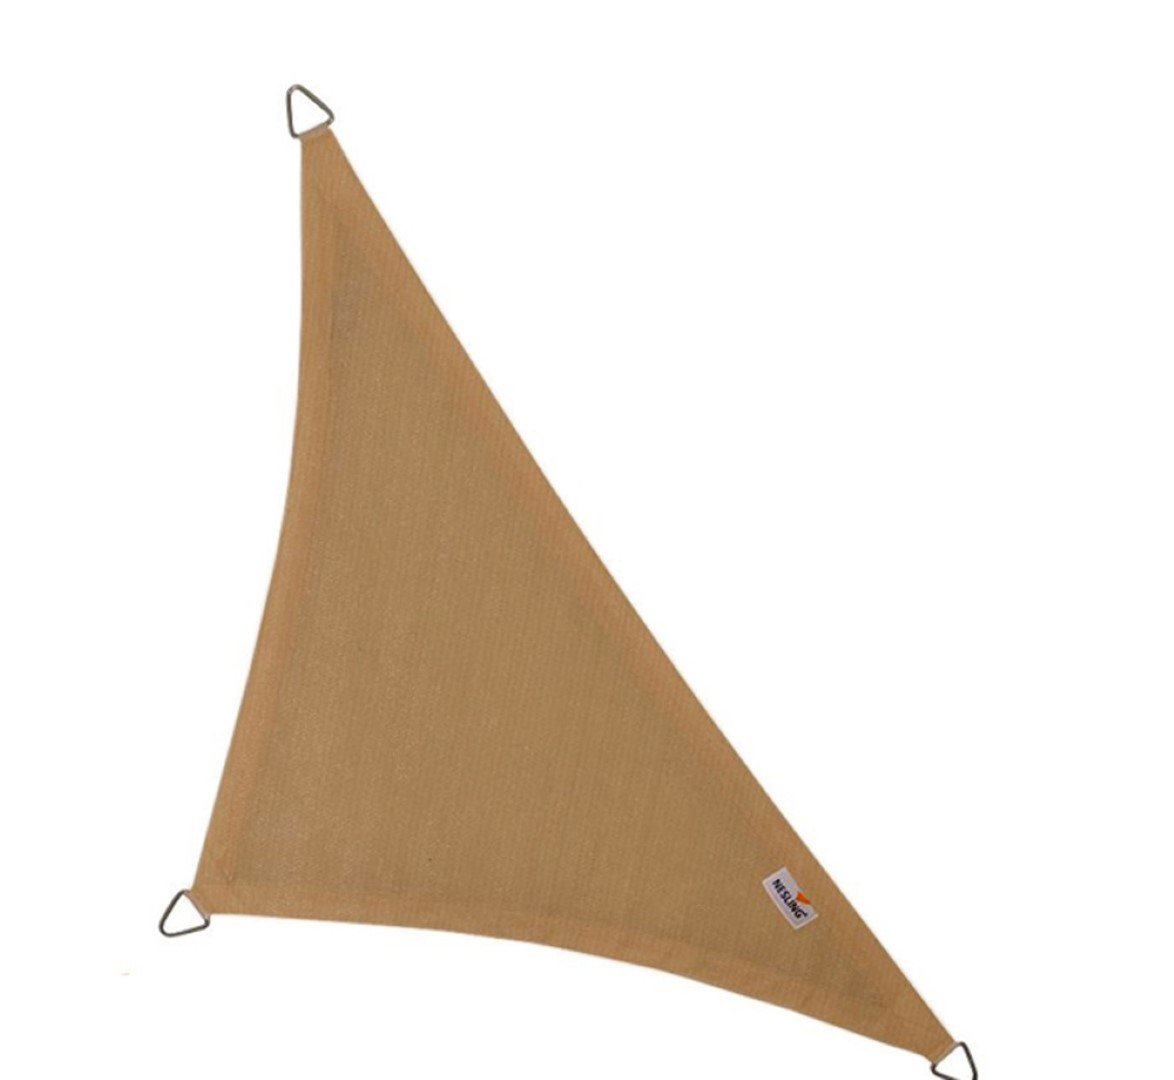 Driehoek 90 , 4,0 x 4,0 x 5,7m, Zand // Sand